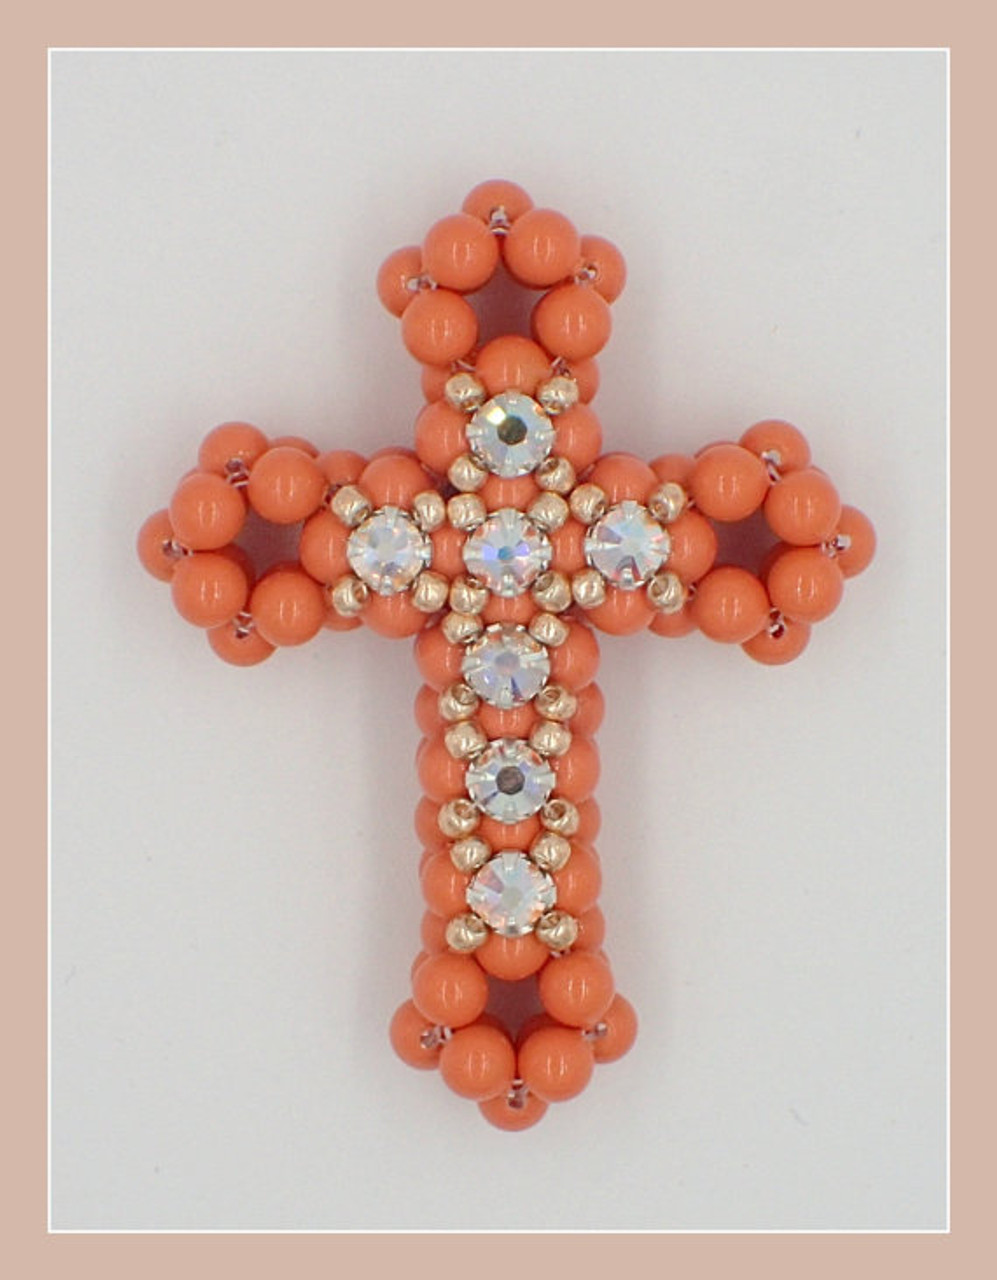 3D Cross with Montees Pendant Tutorial